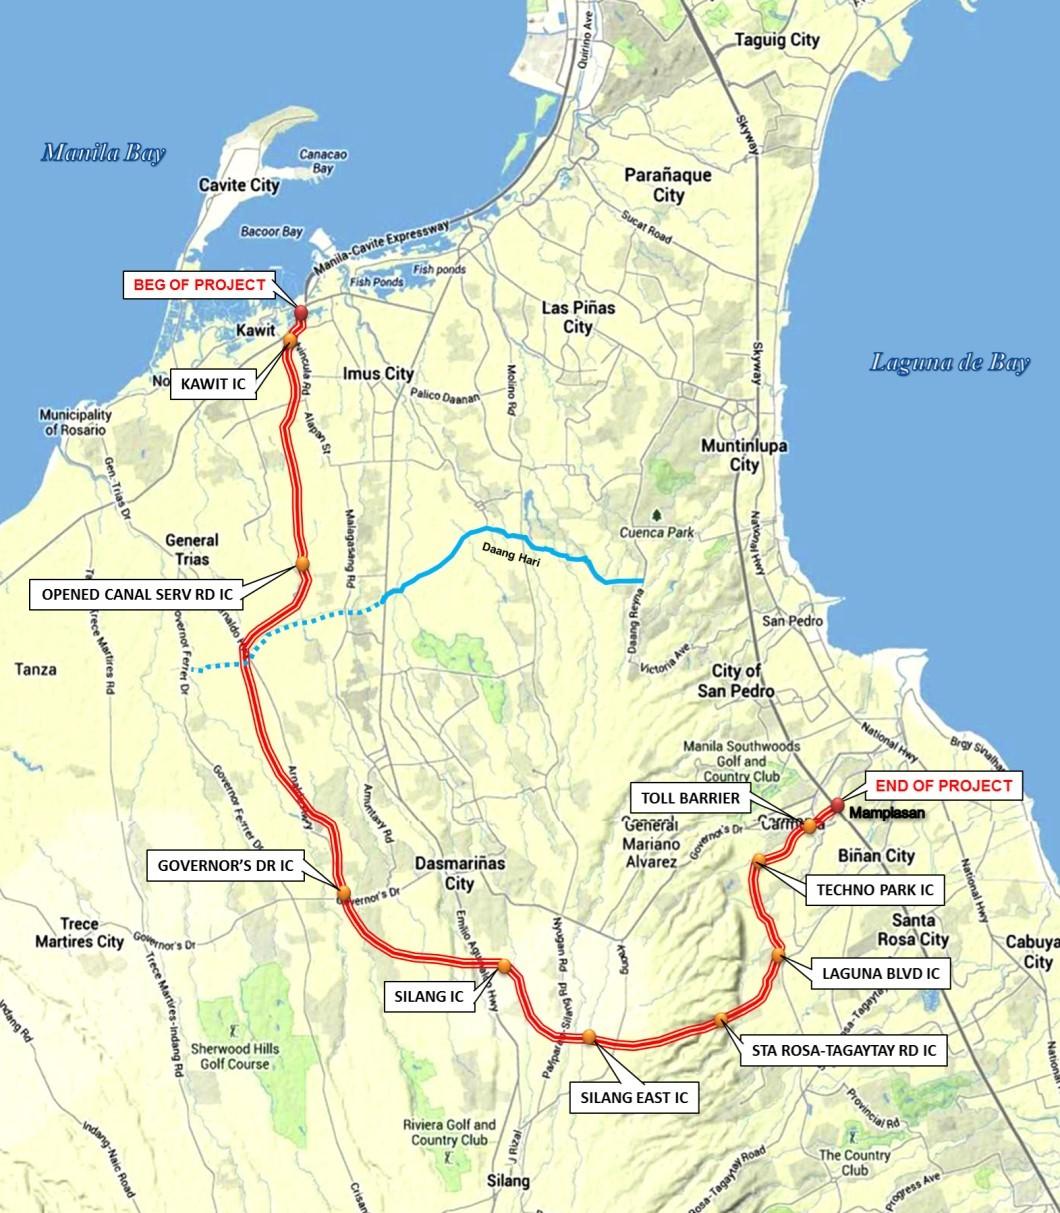 Cavite-Laguna Expressway. Photo courtesy of DPWH.